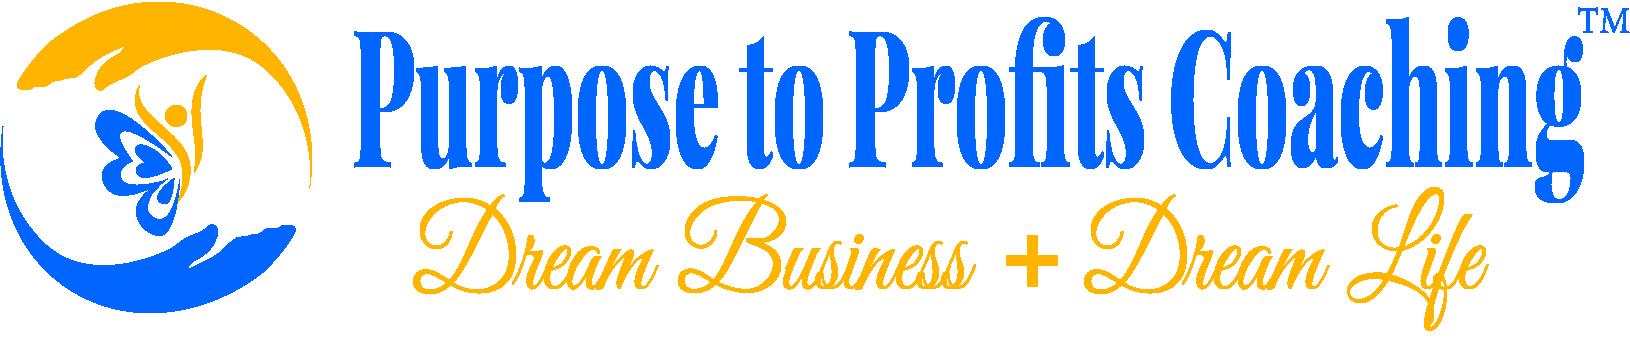 Purpose to Profits Coaching: Quantum Leap Your Biz to 6 Figures+